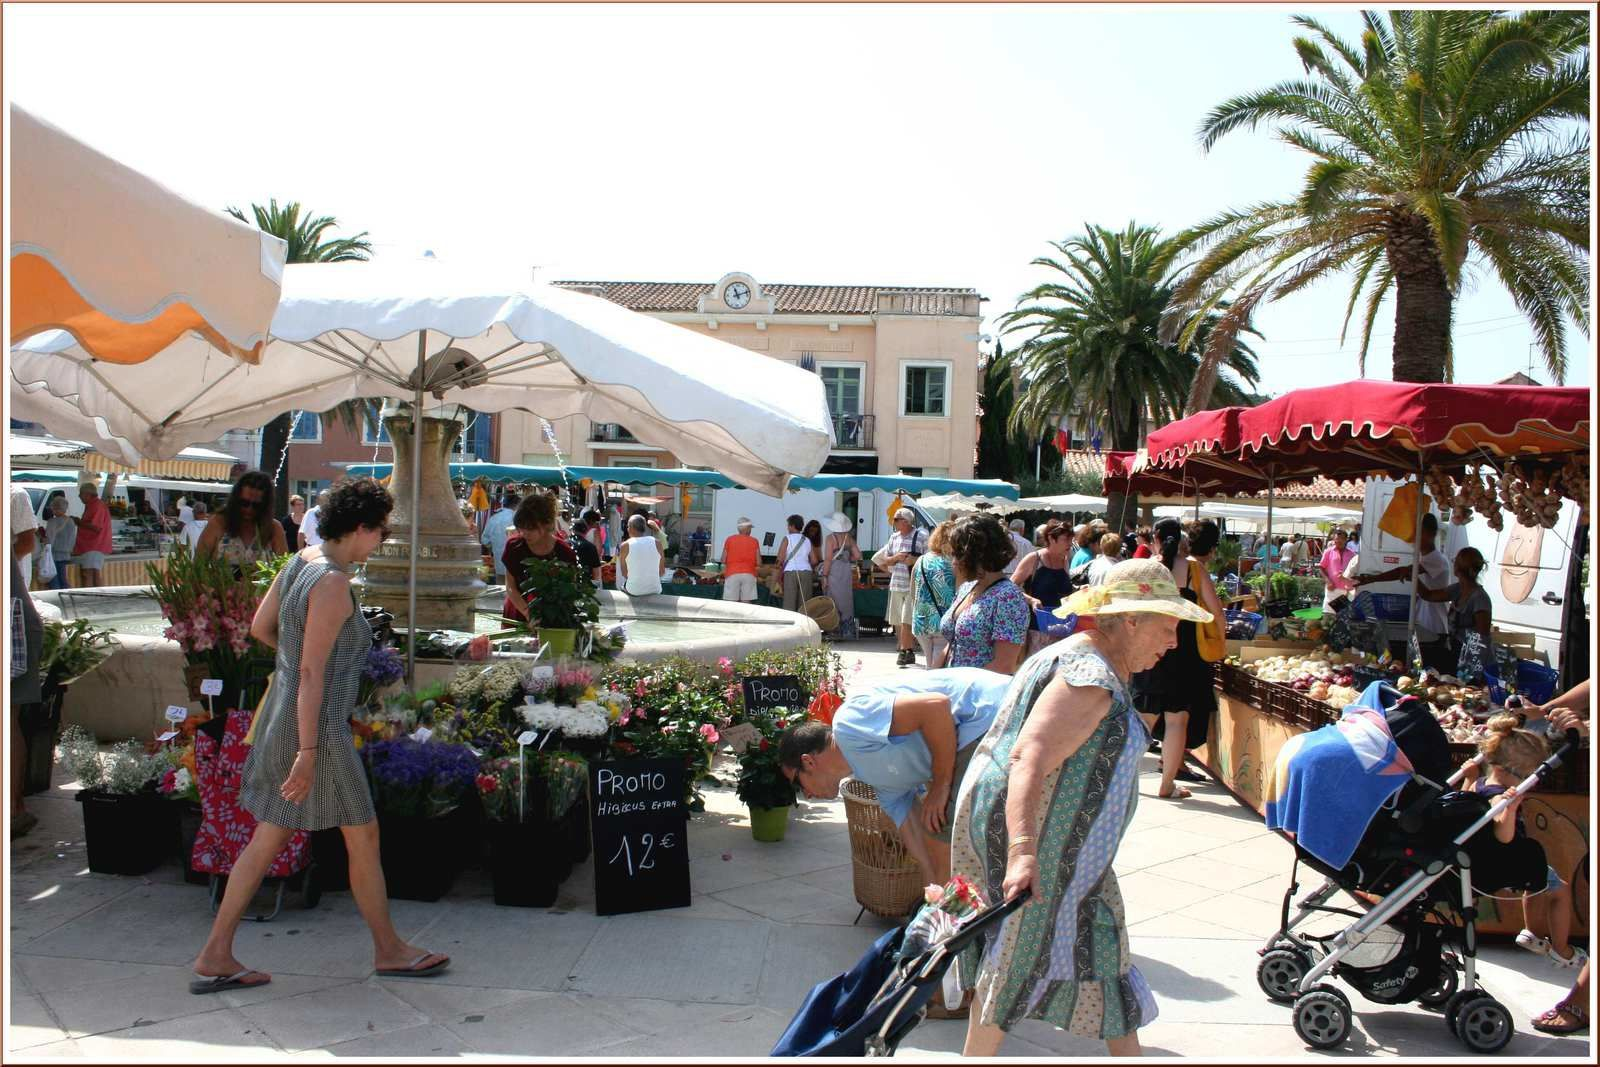 Le marché du samedi matin...